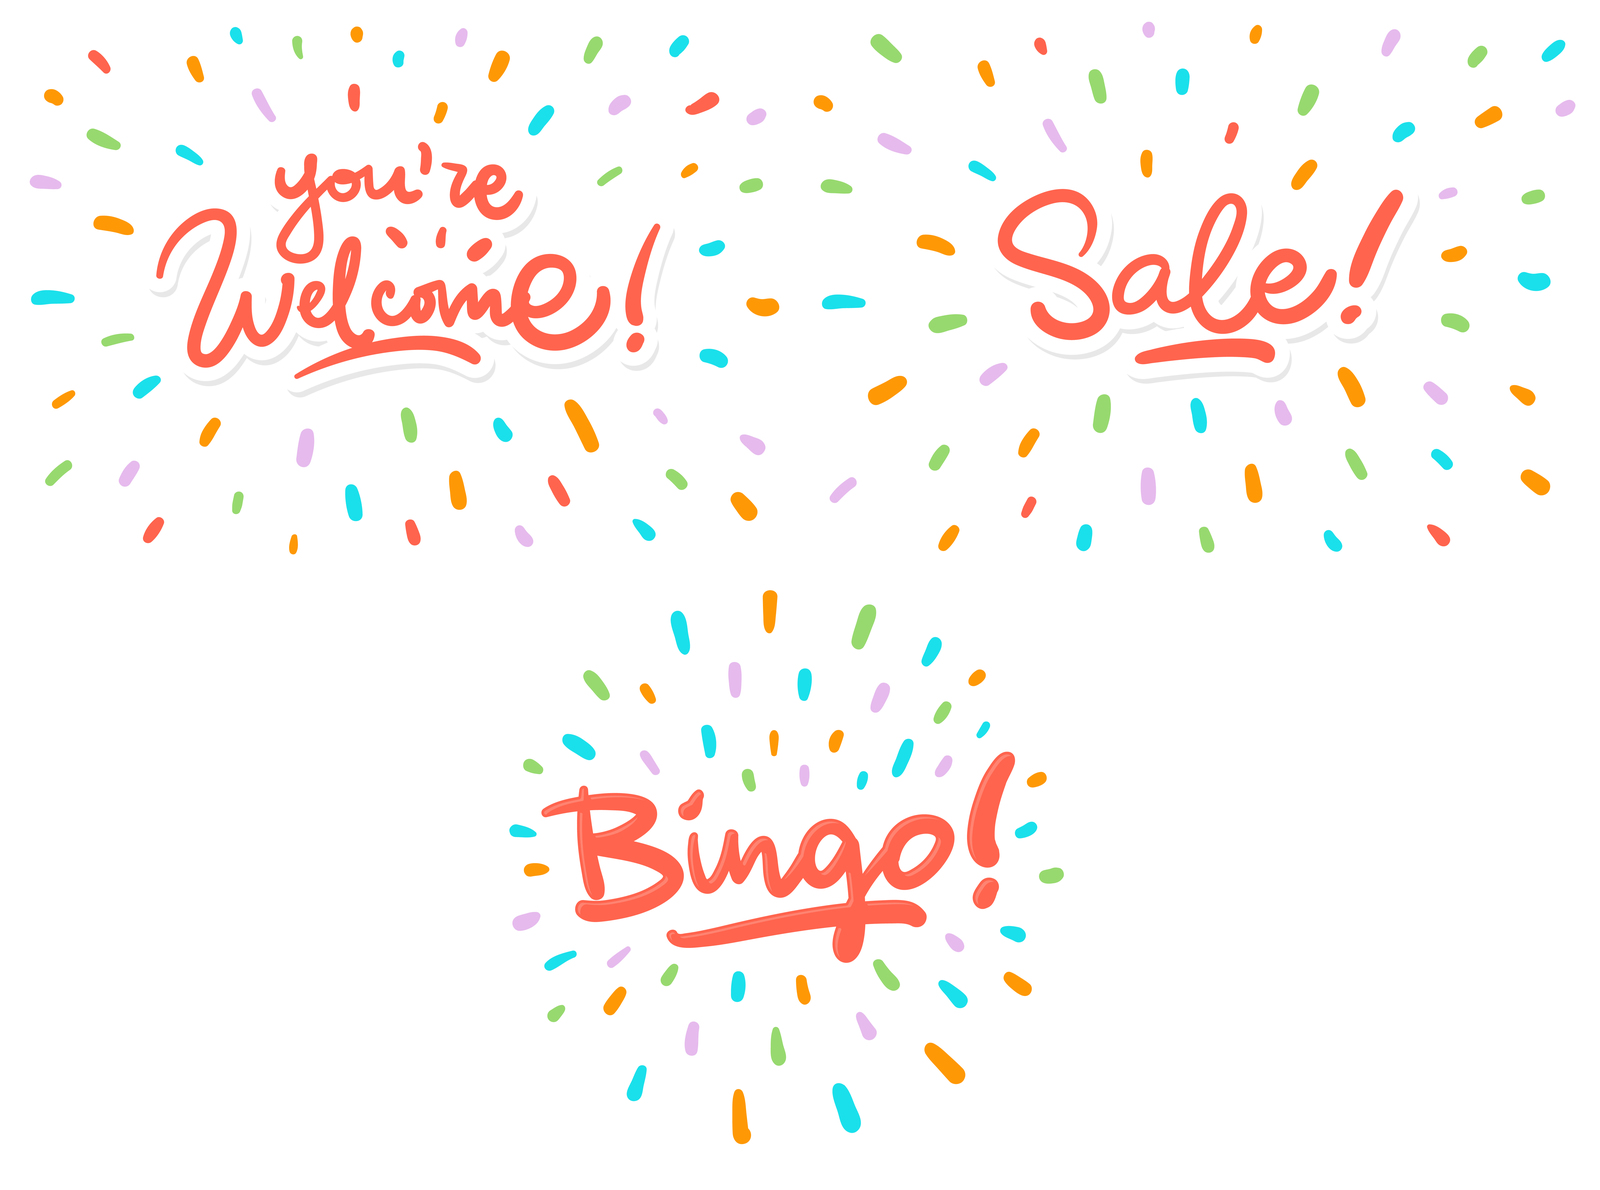 Bingo, Sale, New & Welcome lettering bundle